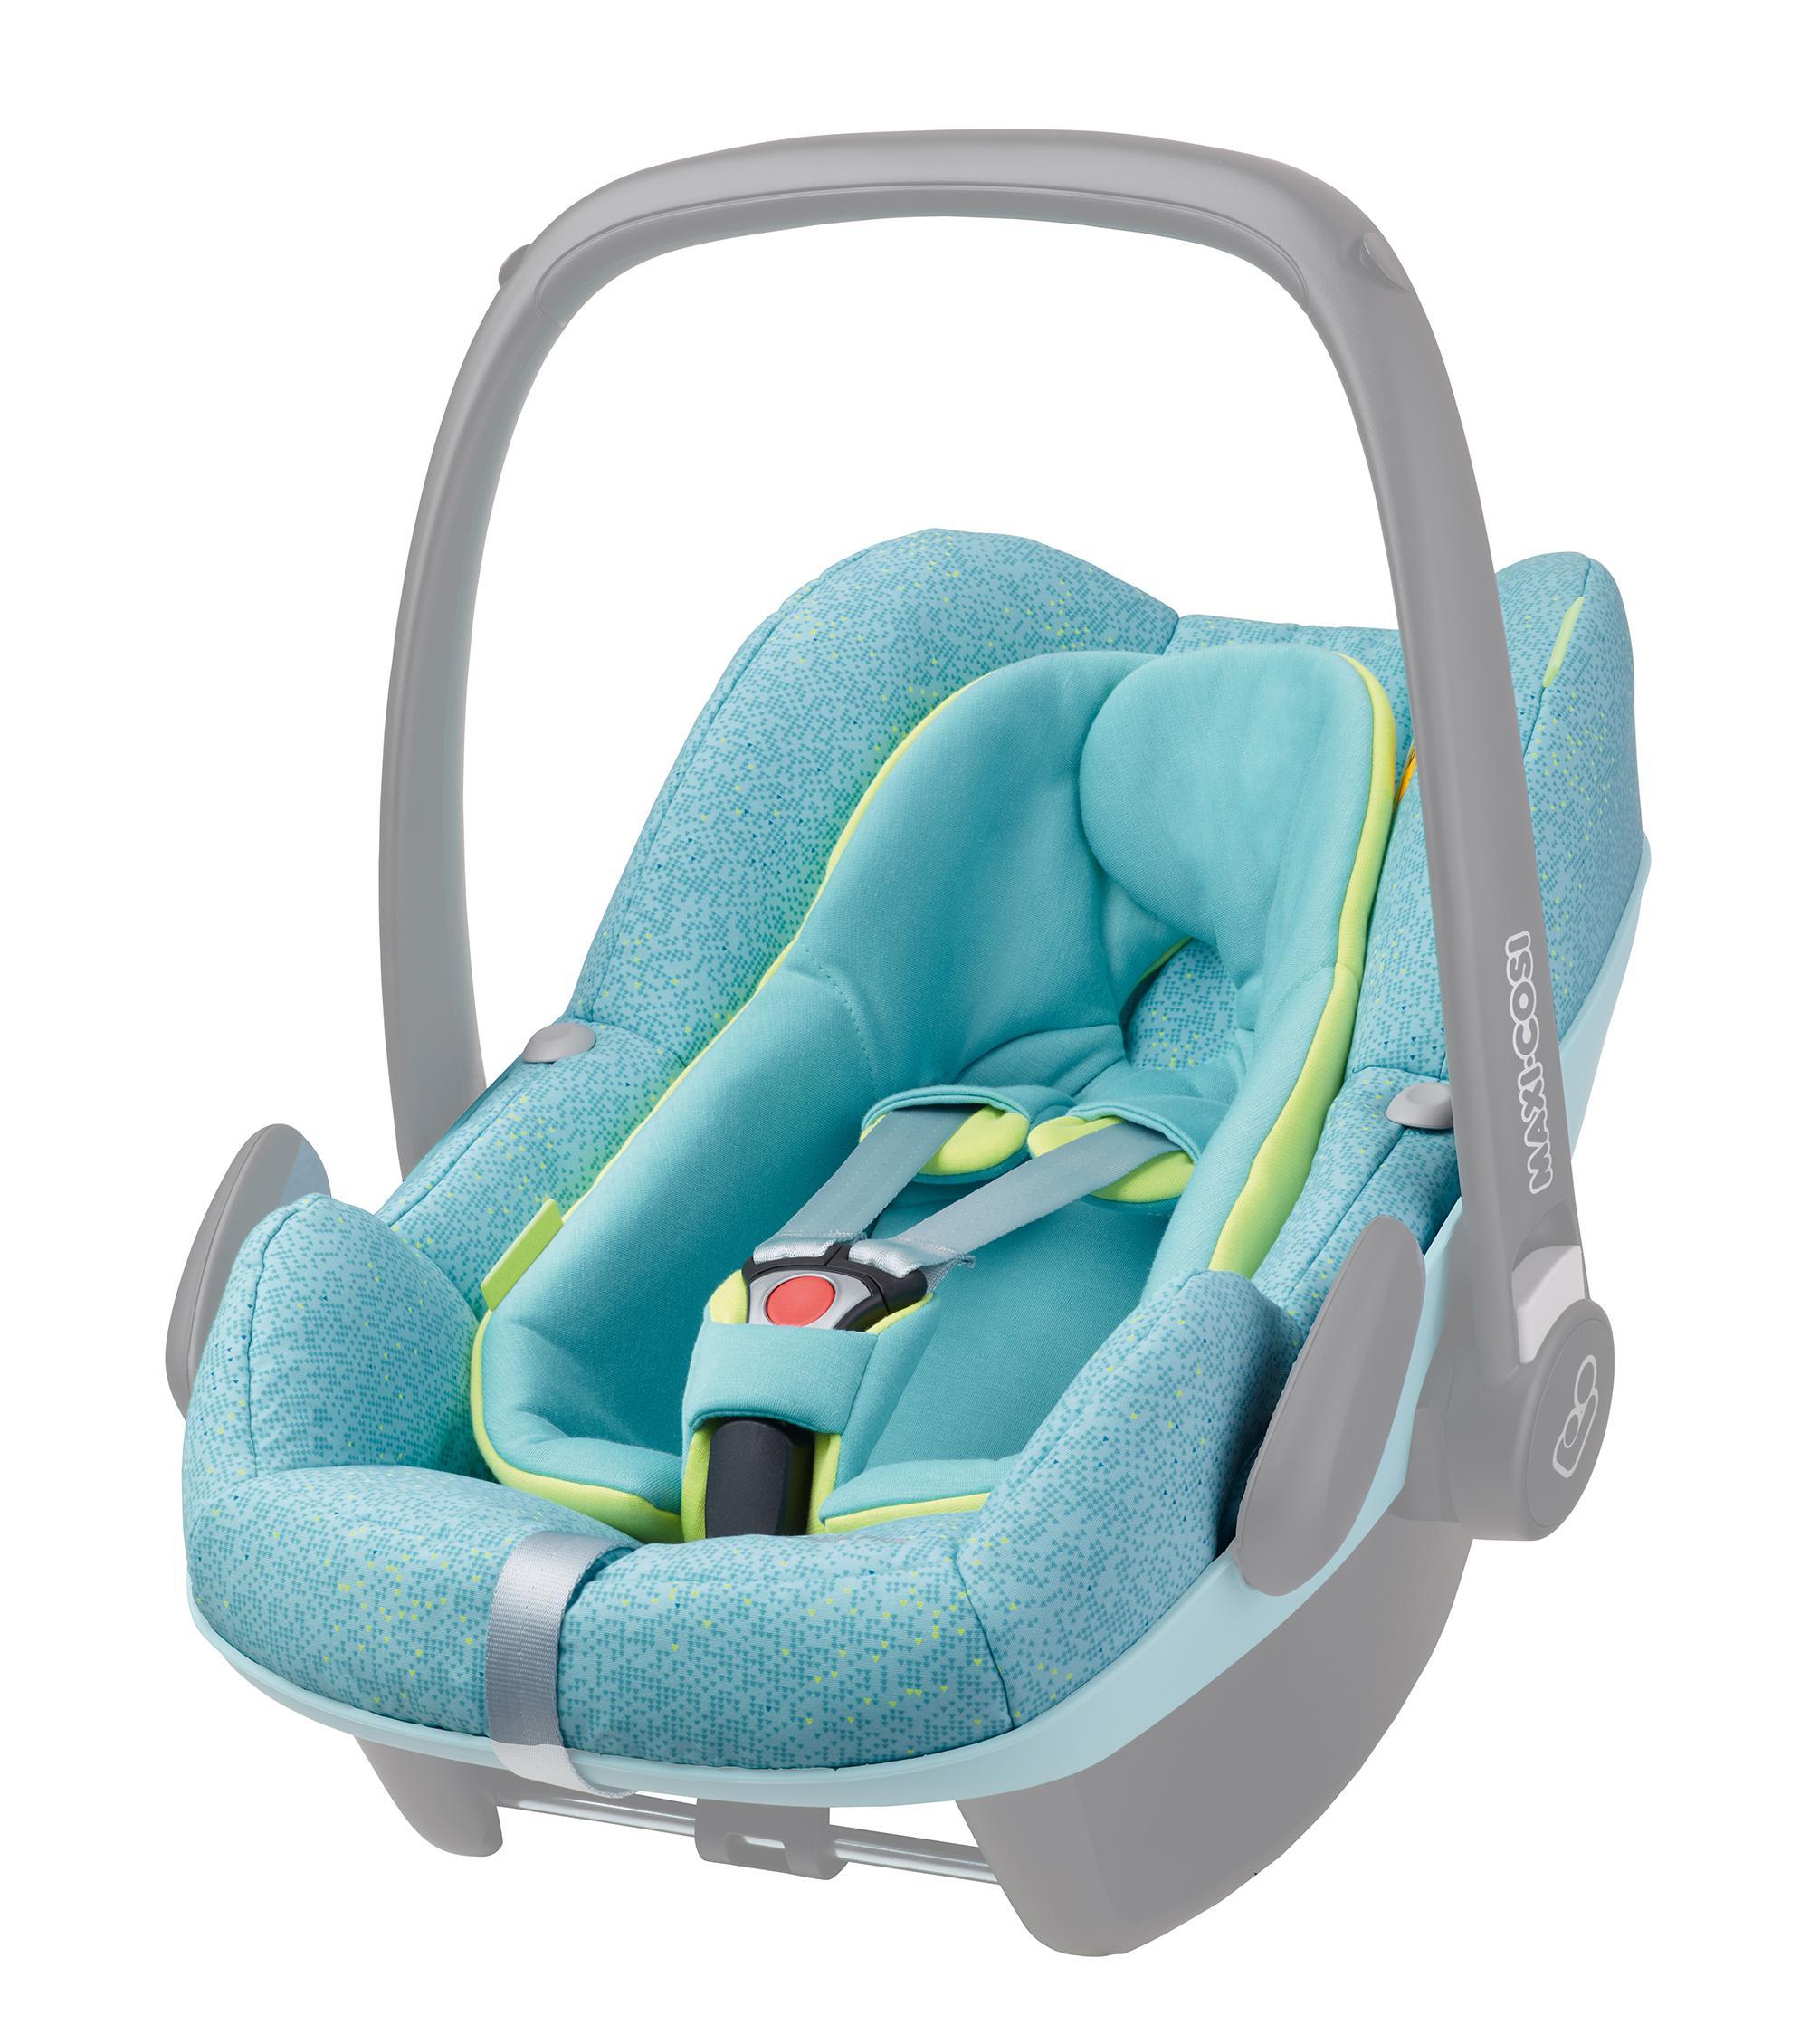 Maxi Cosi Pebble Plus Seat Cover